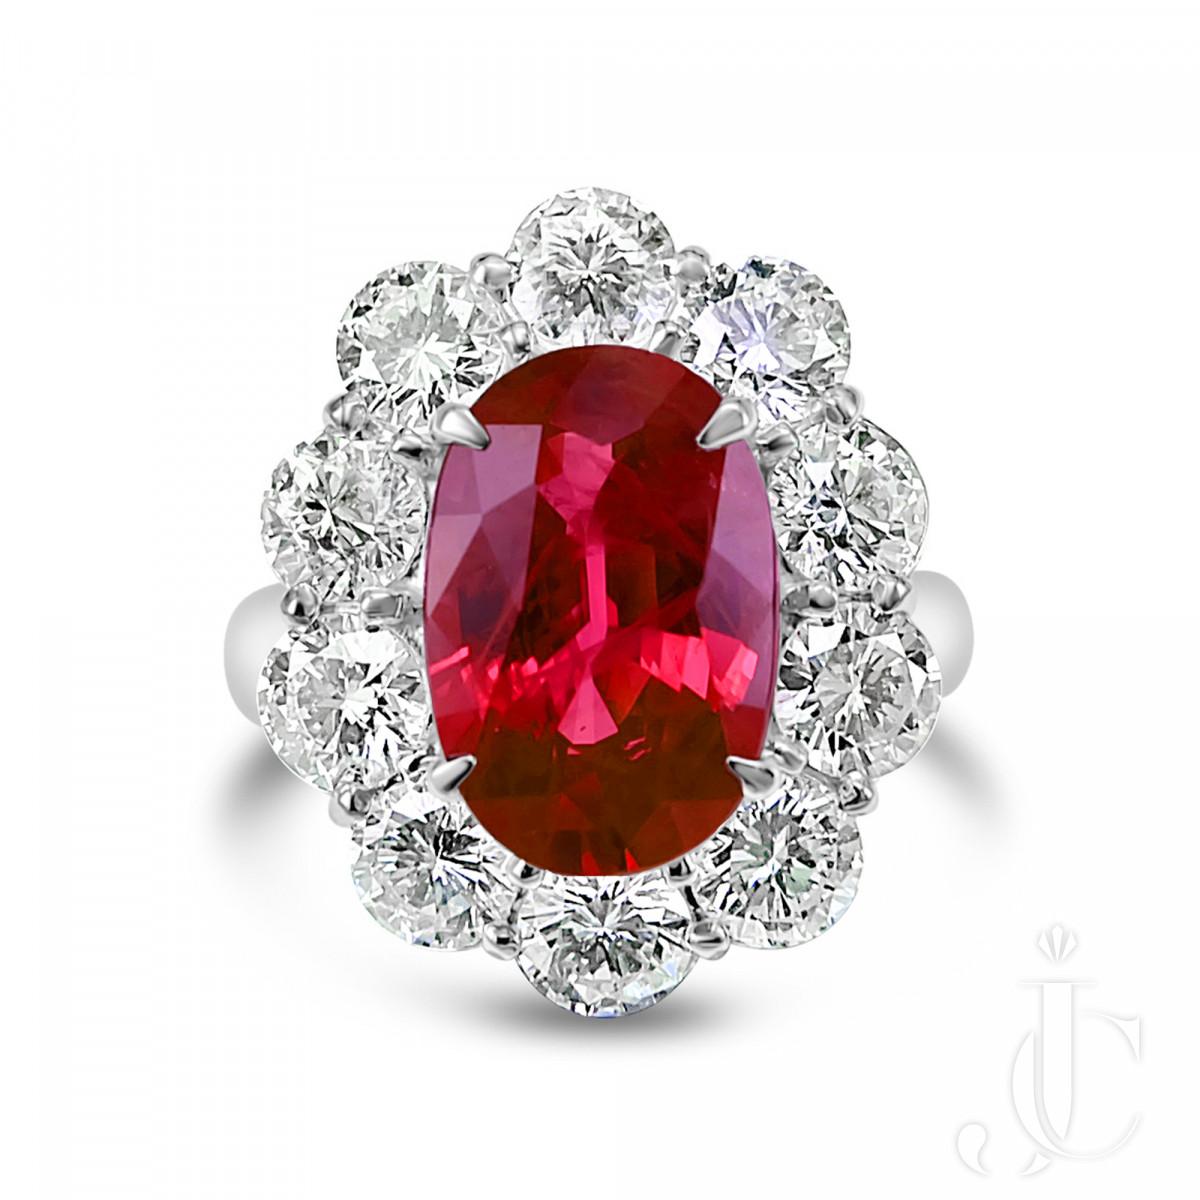 GIA Certified 4.18 Carat BURMA Ruby and 2.41 Carat Diamond Wedding Ring